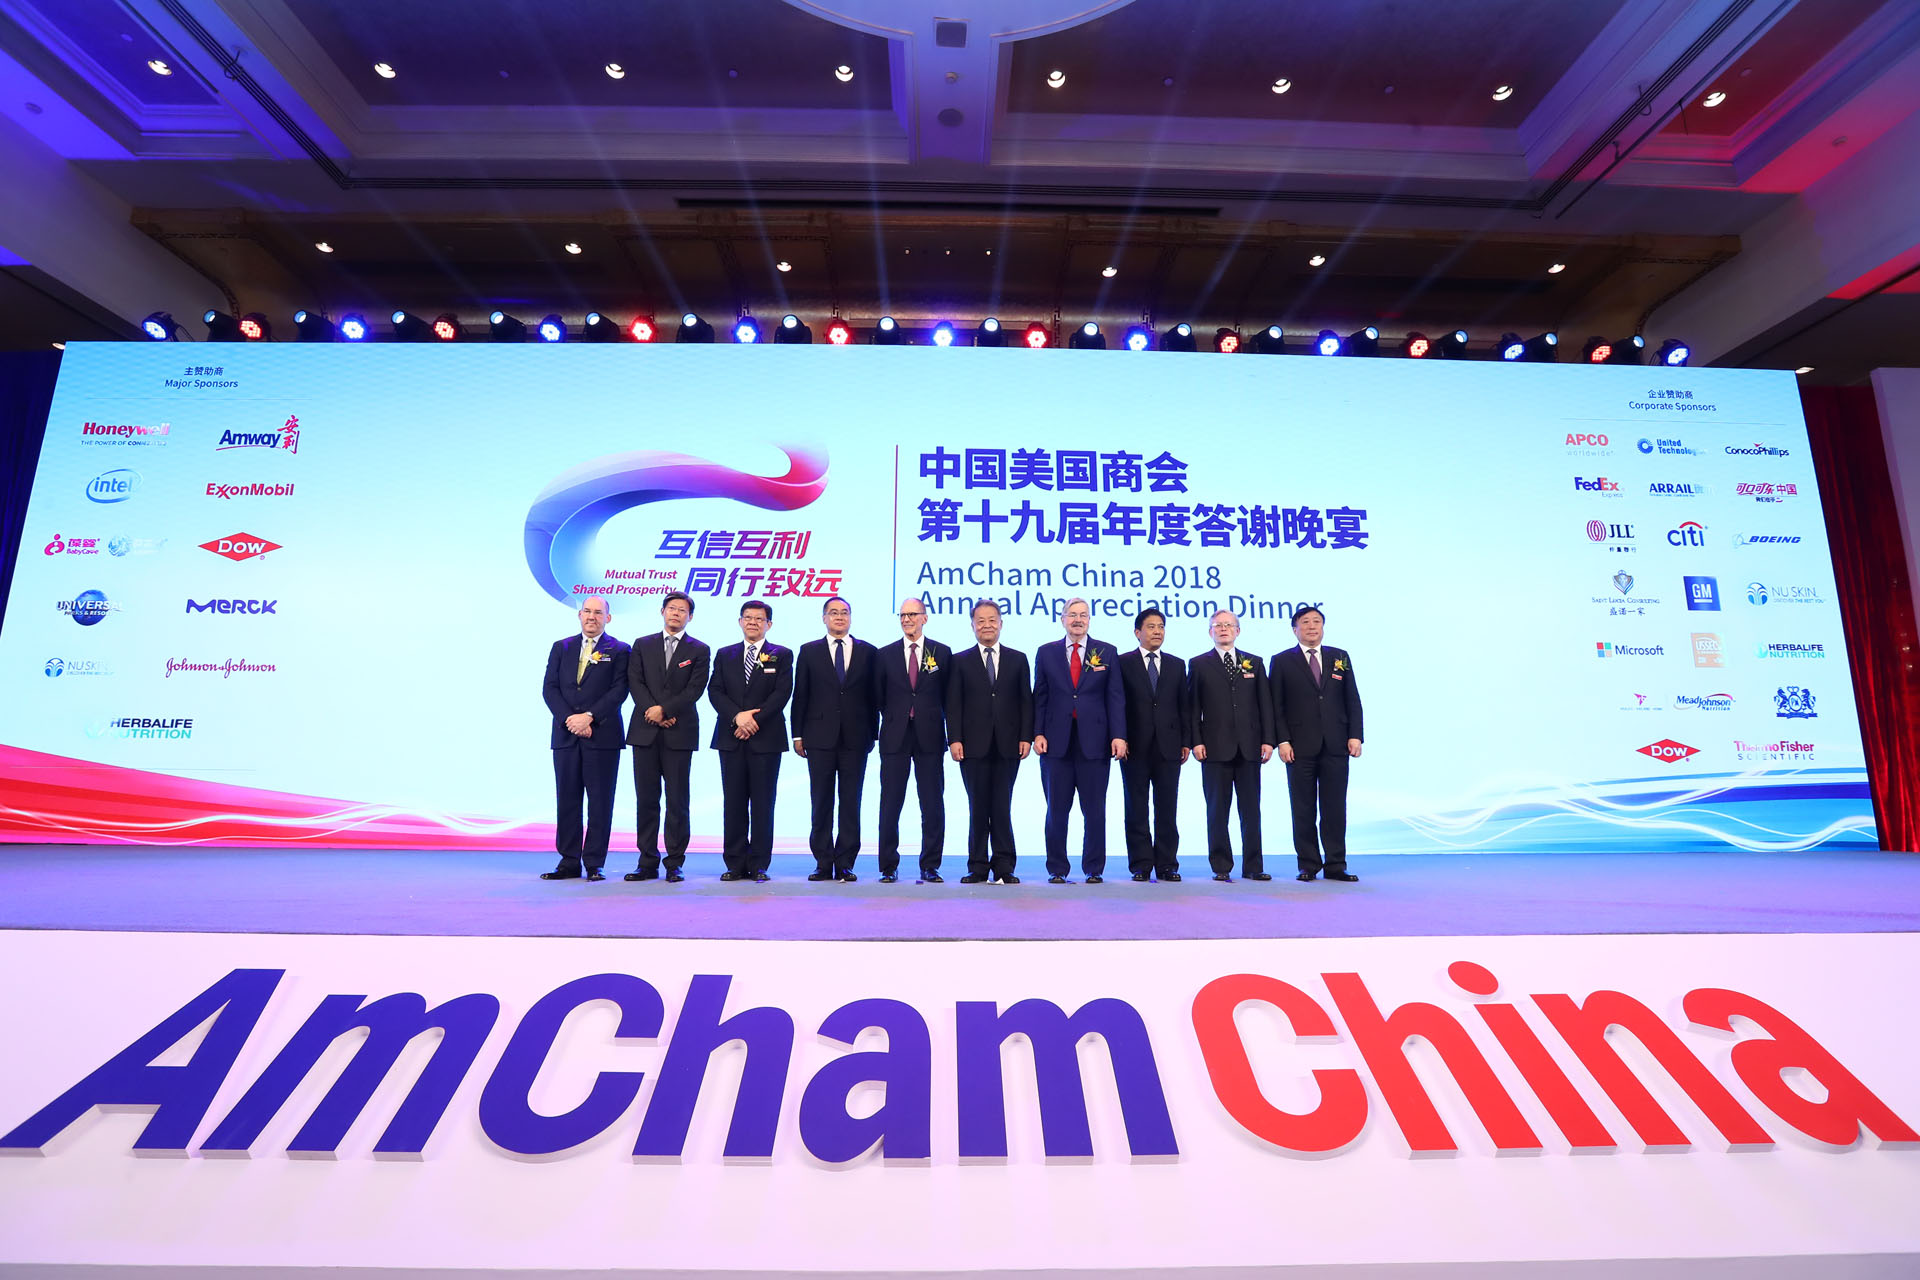 AmCham China Events